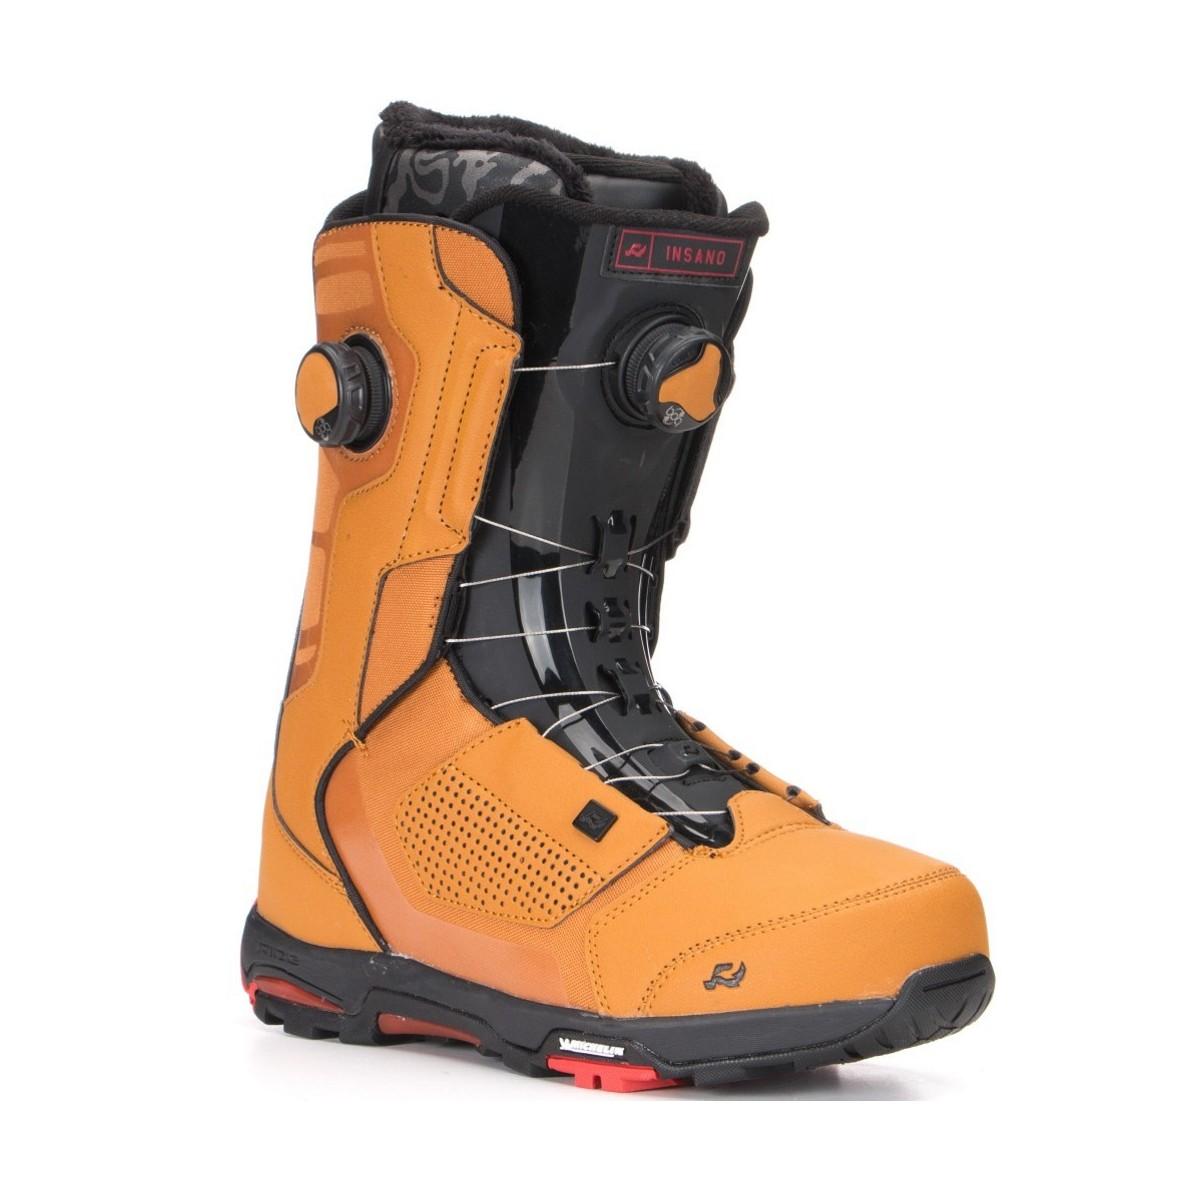 RIDE INSANO FOCUS BROWN SNOWBOARD BOOT b67b869c3